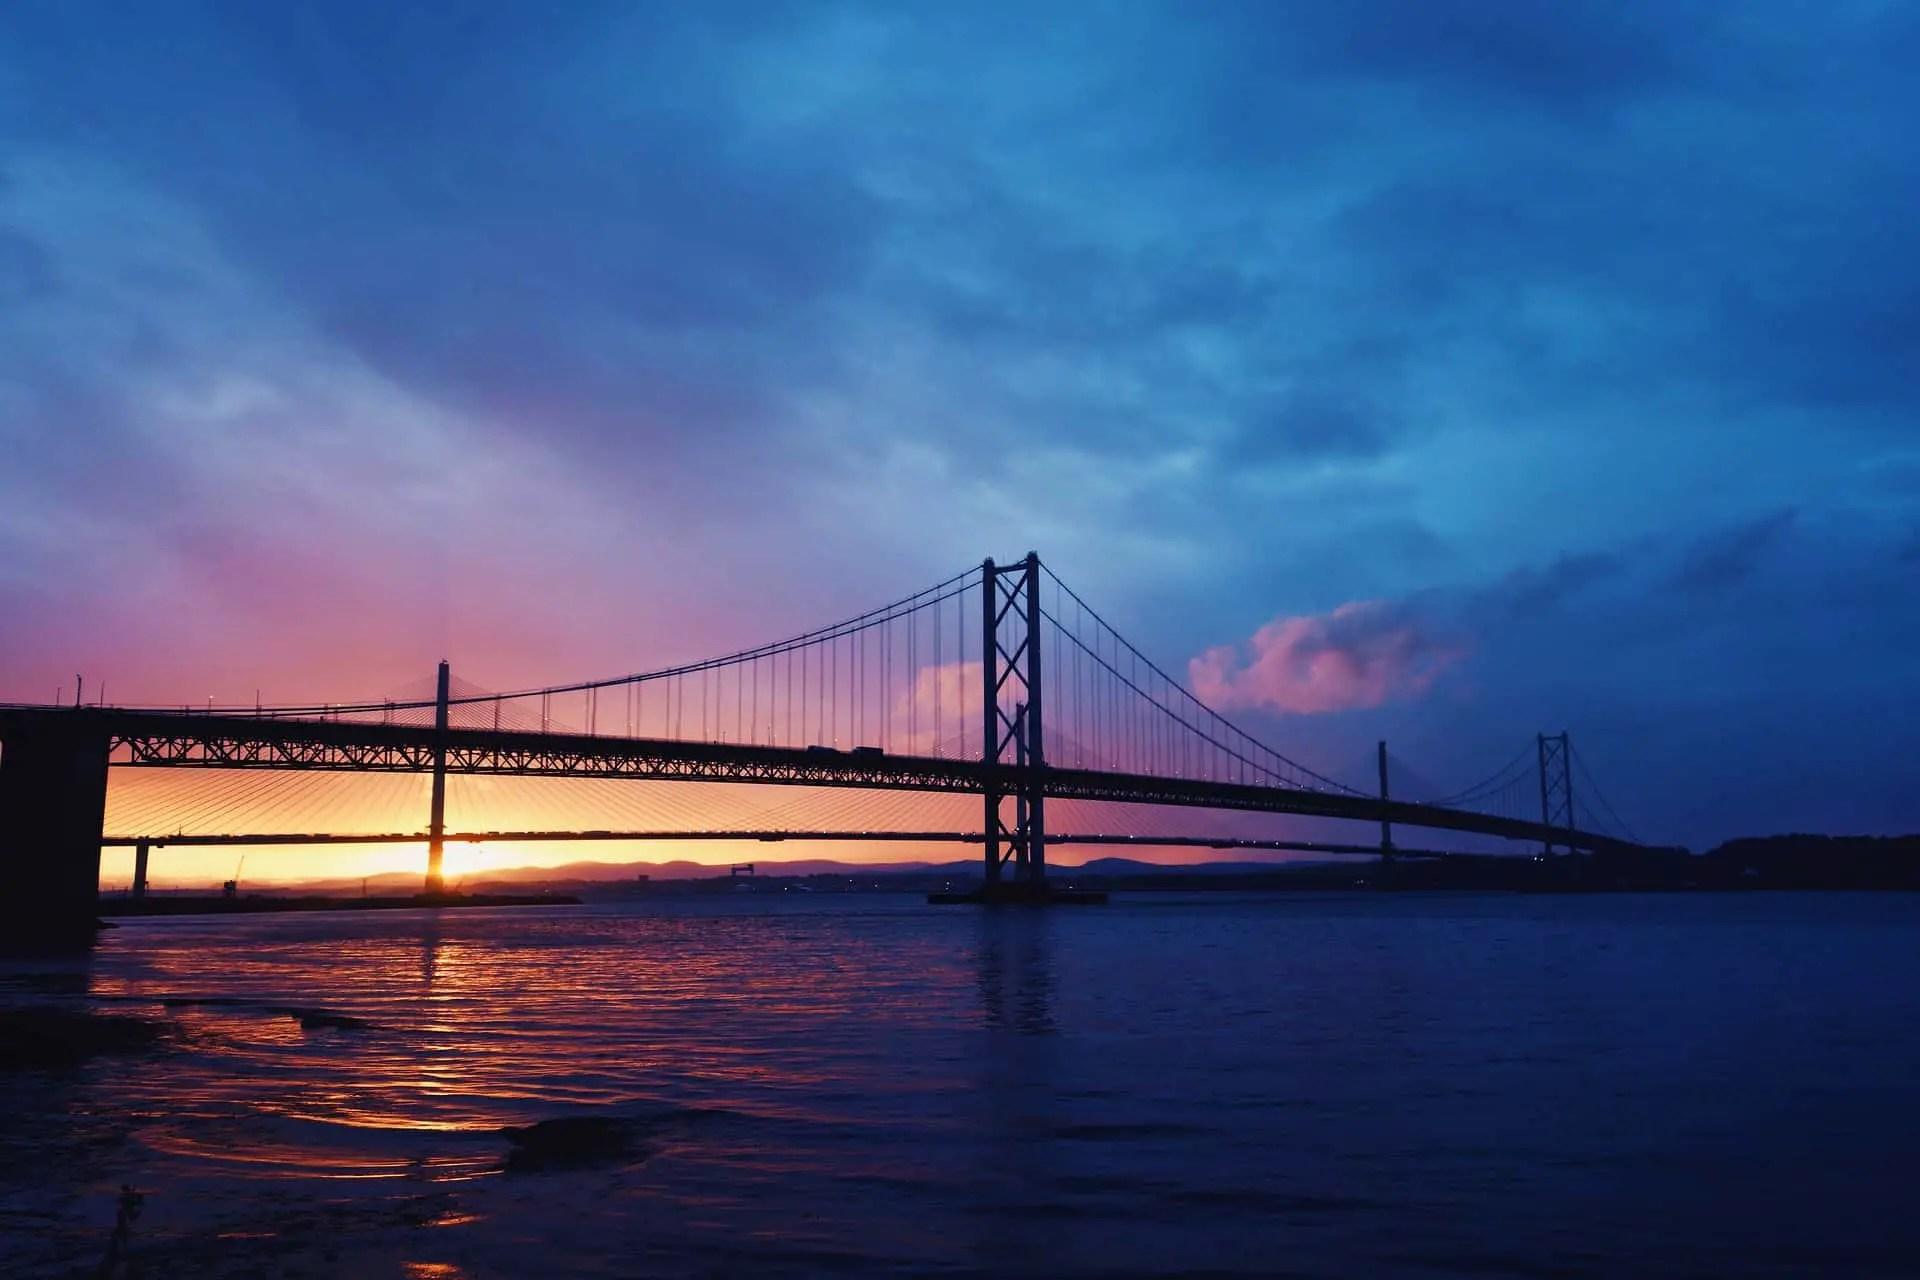 The Forth Bridges at Dusk